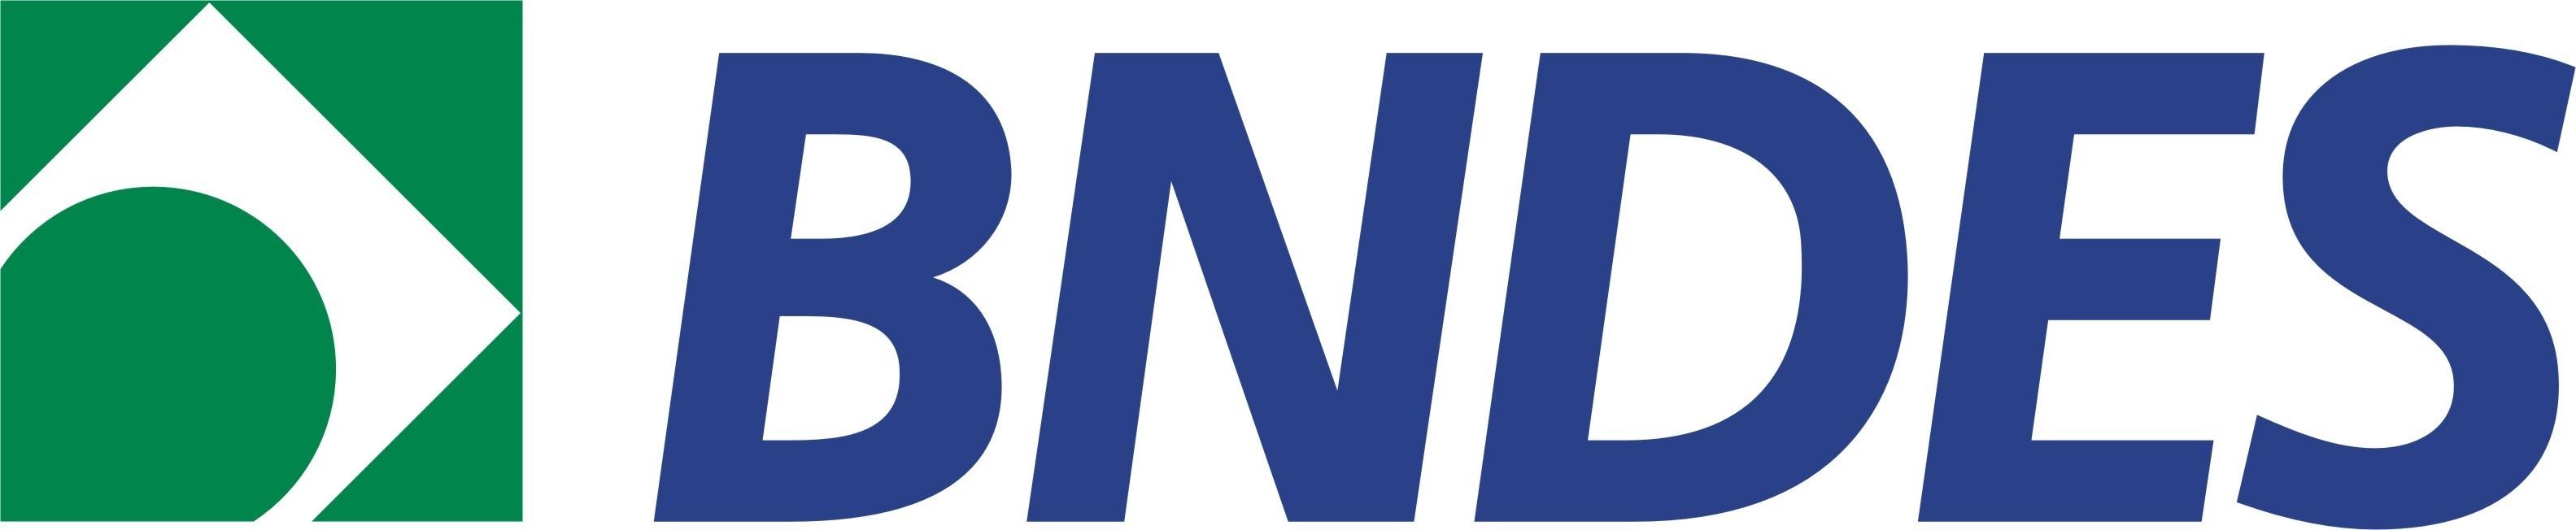 Bndes-logo.jpg